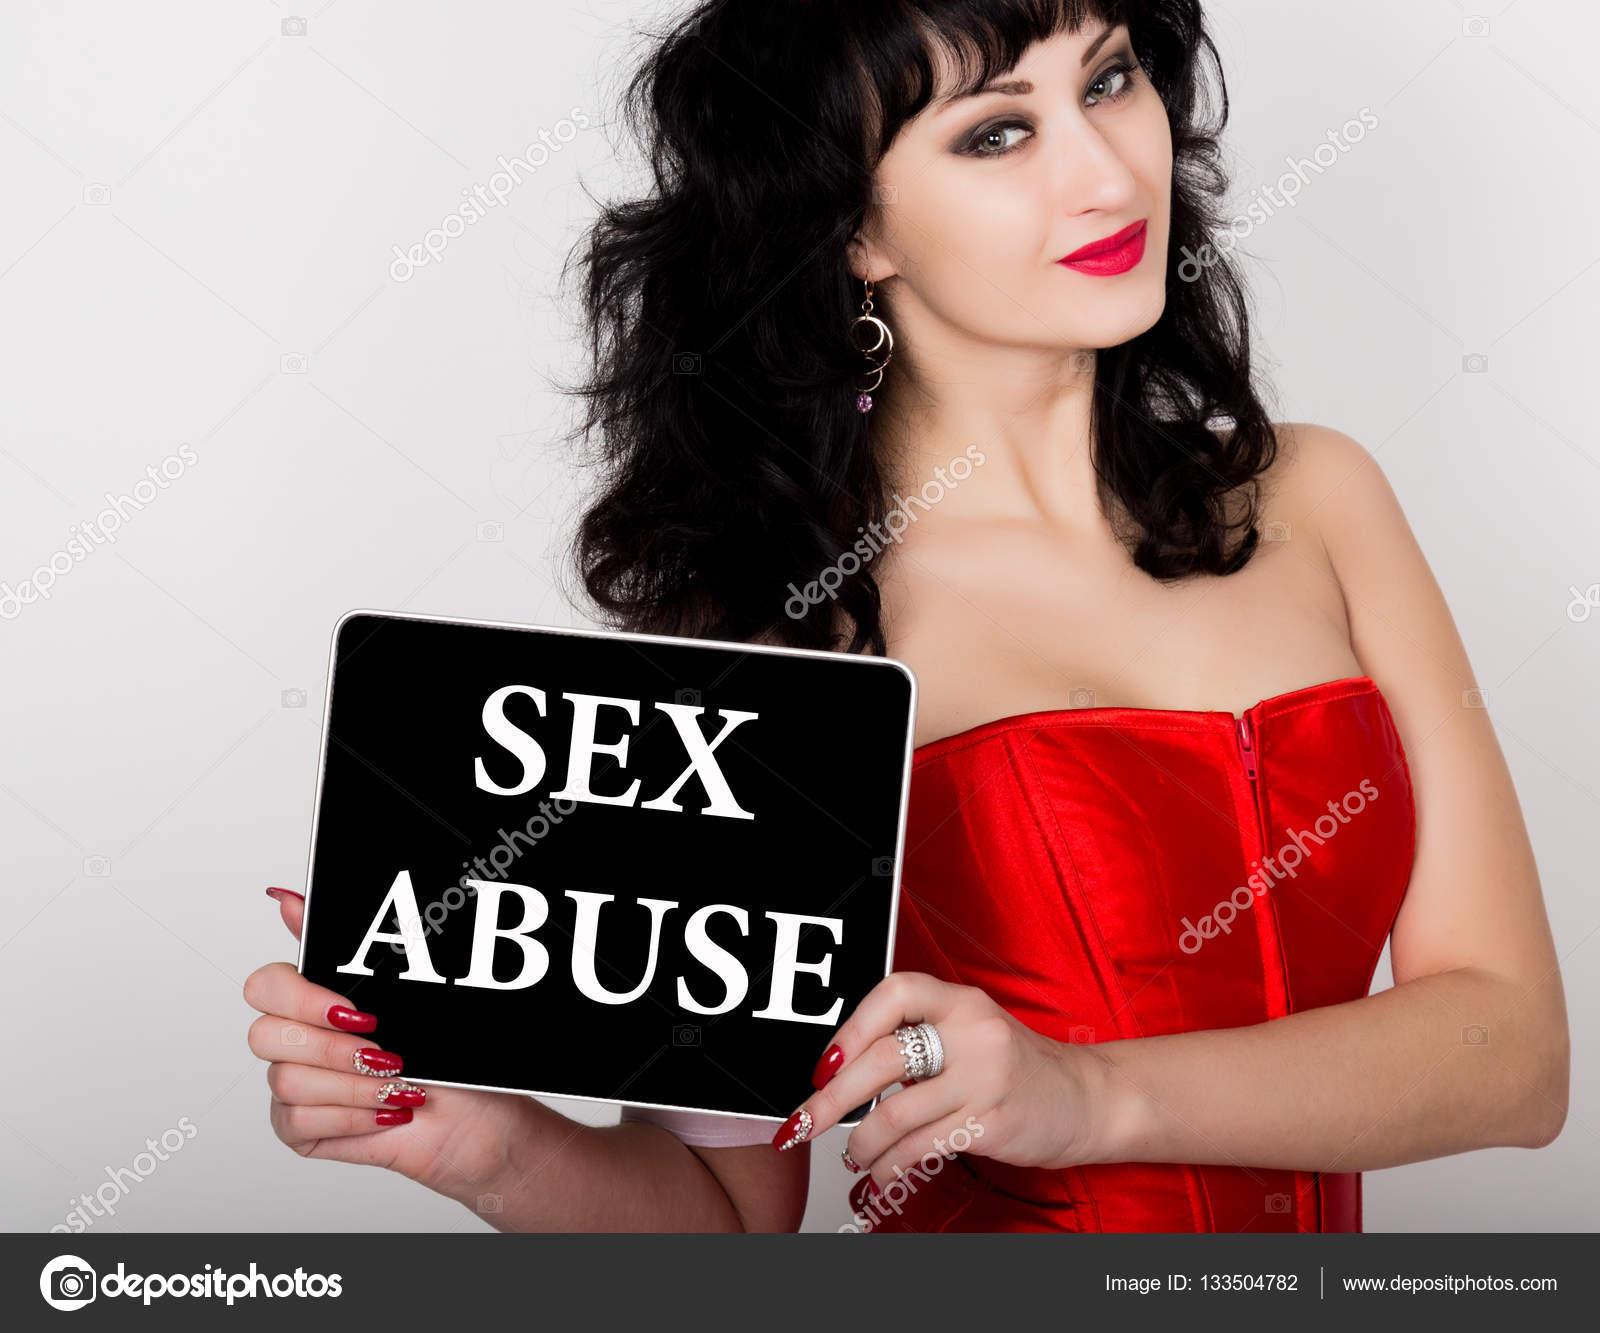 Written account of girl having sex